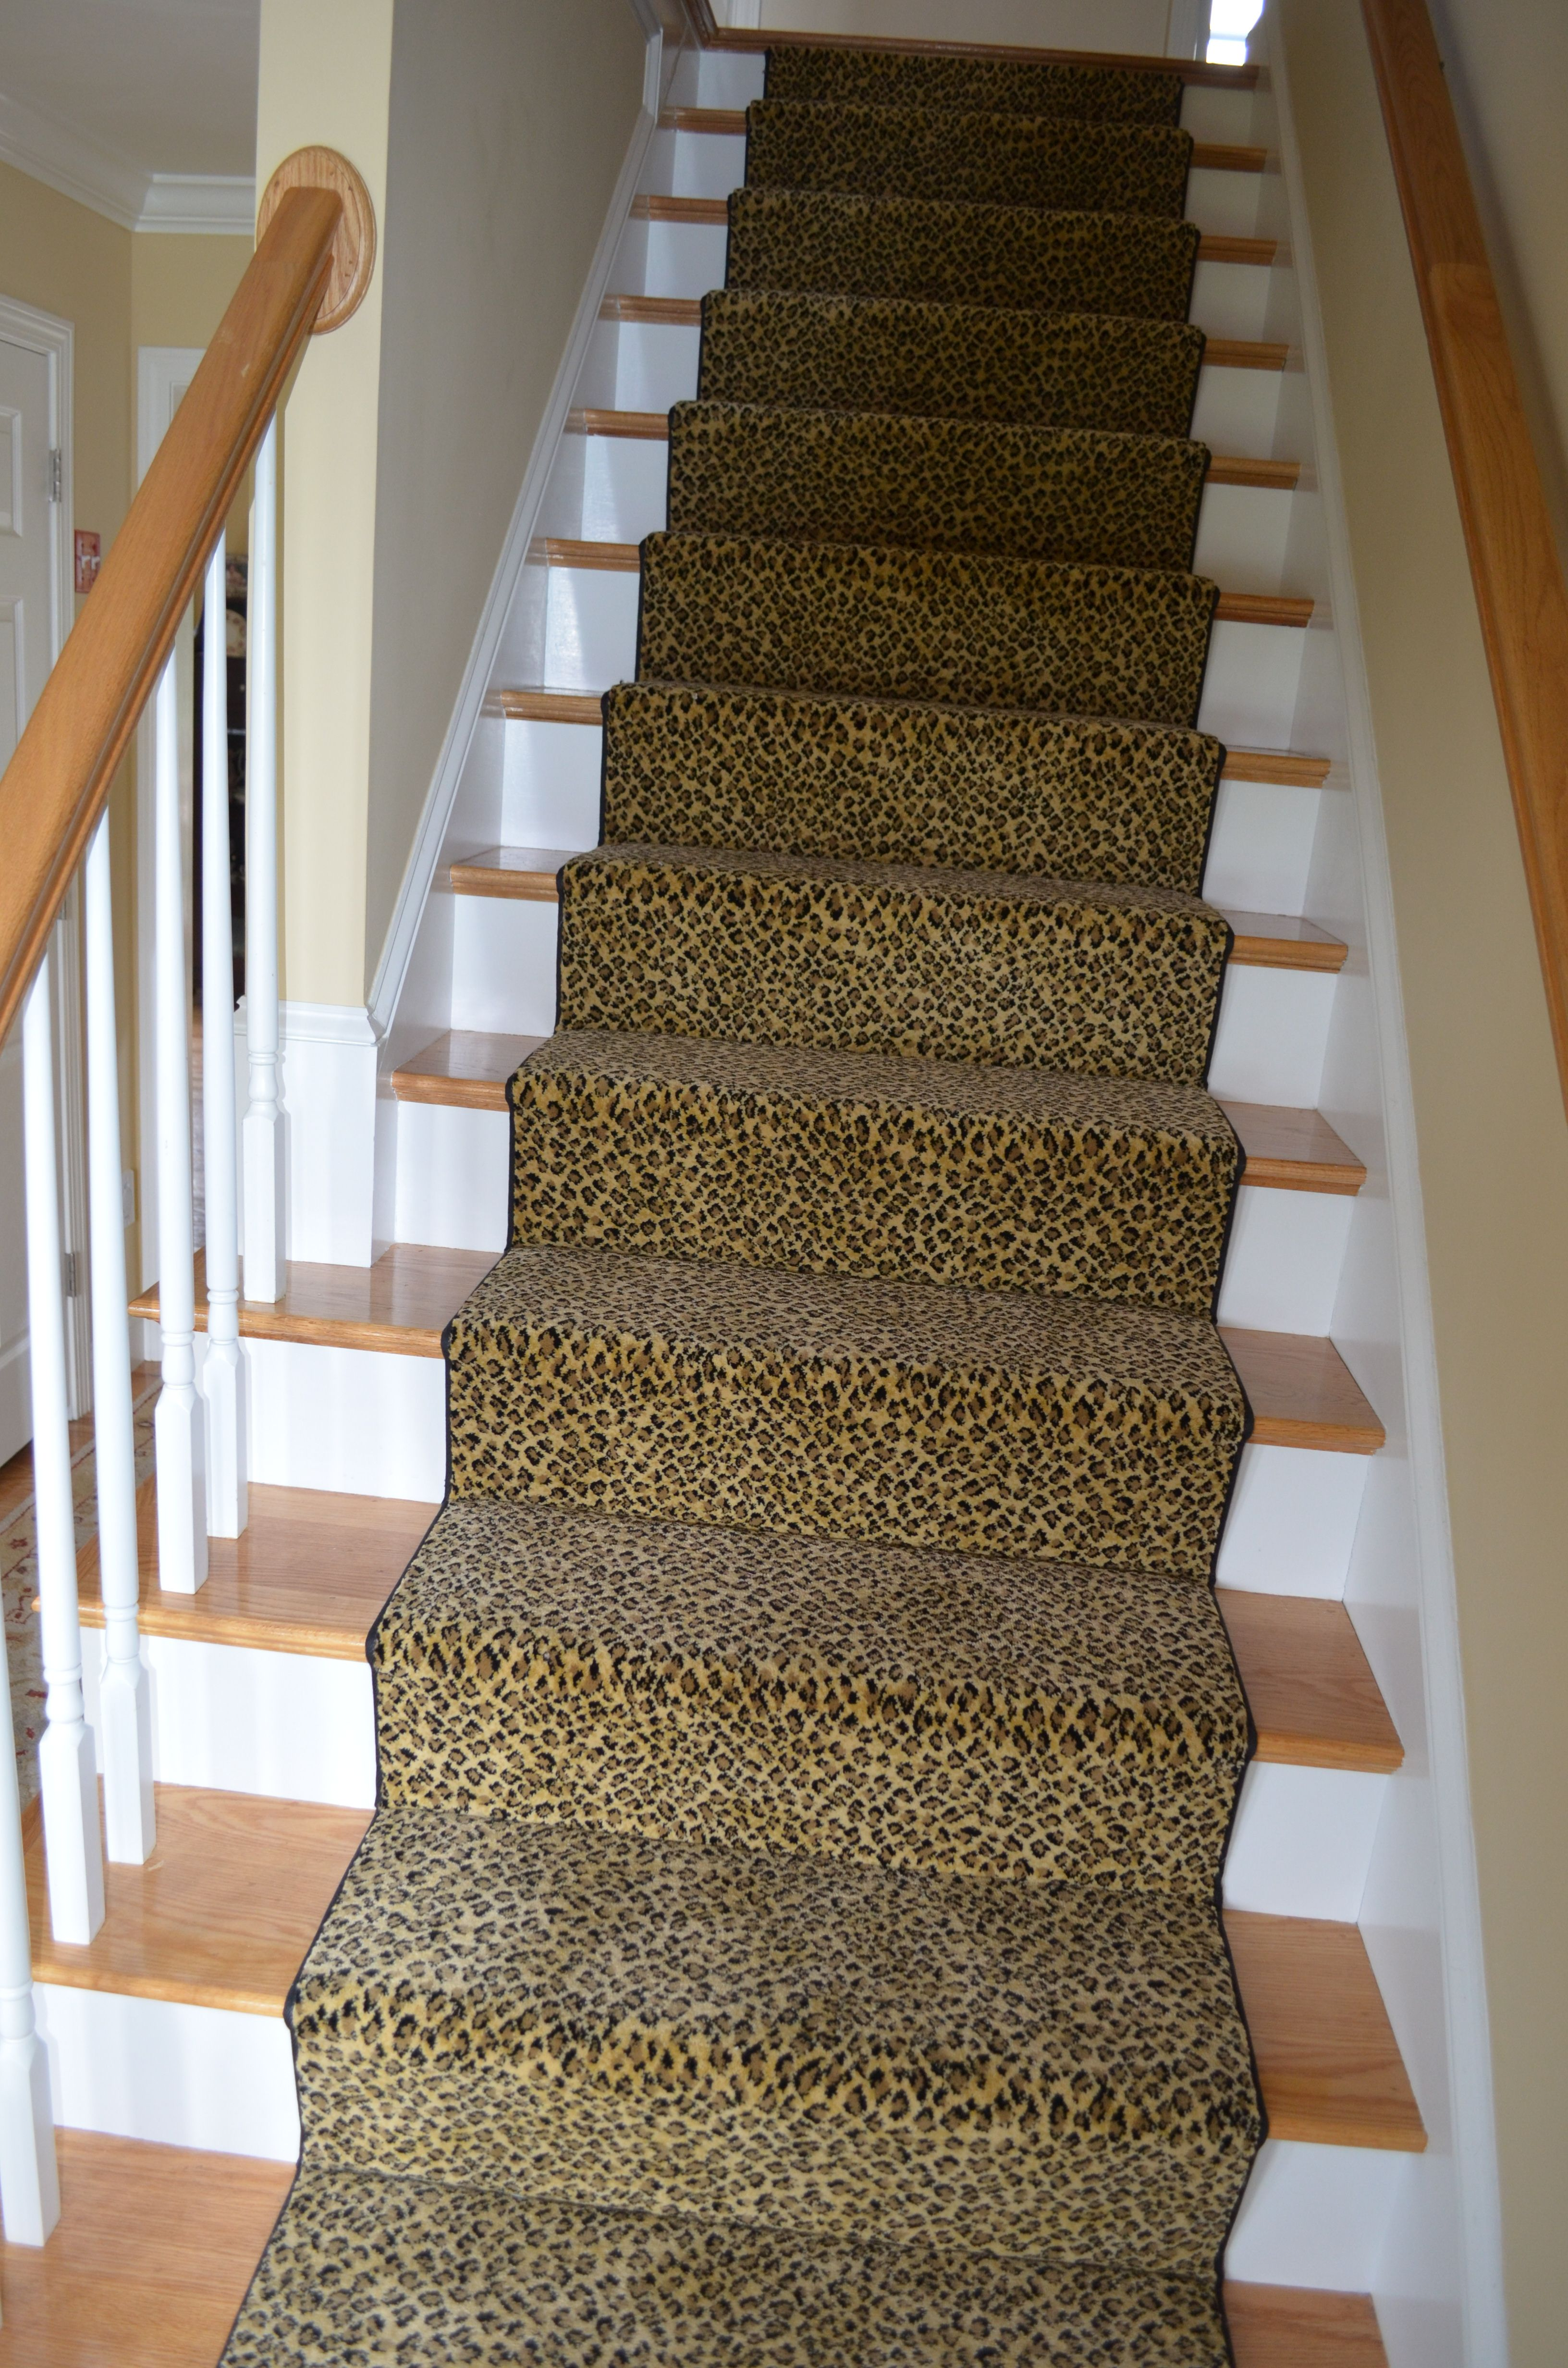 Cheetah Print Stair Runner Installed In Belmont Ma Http Carpetworkroom